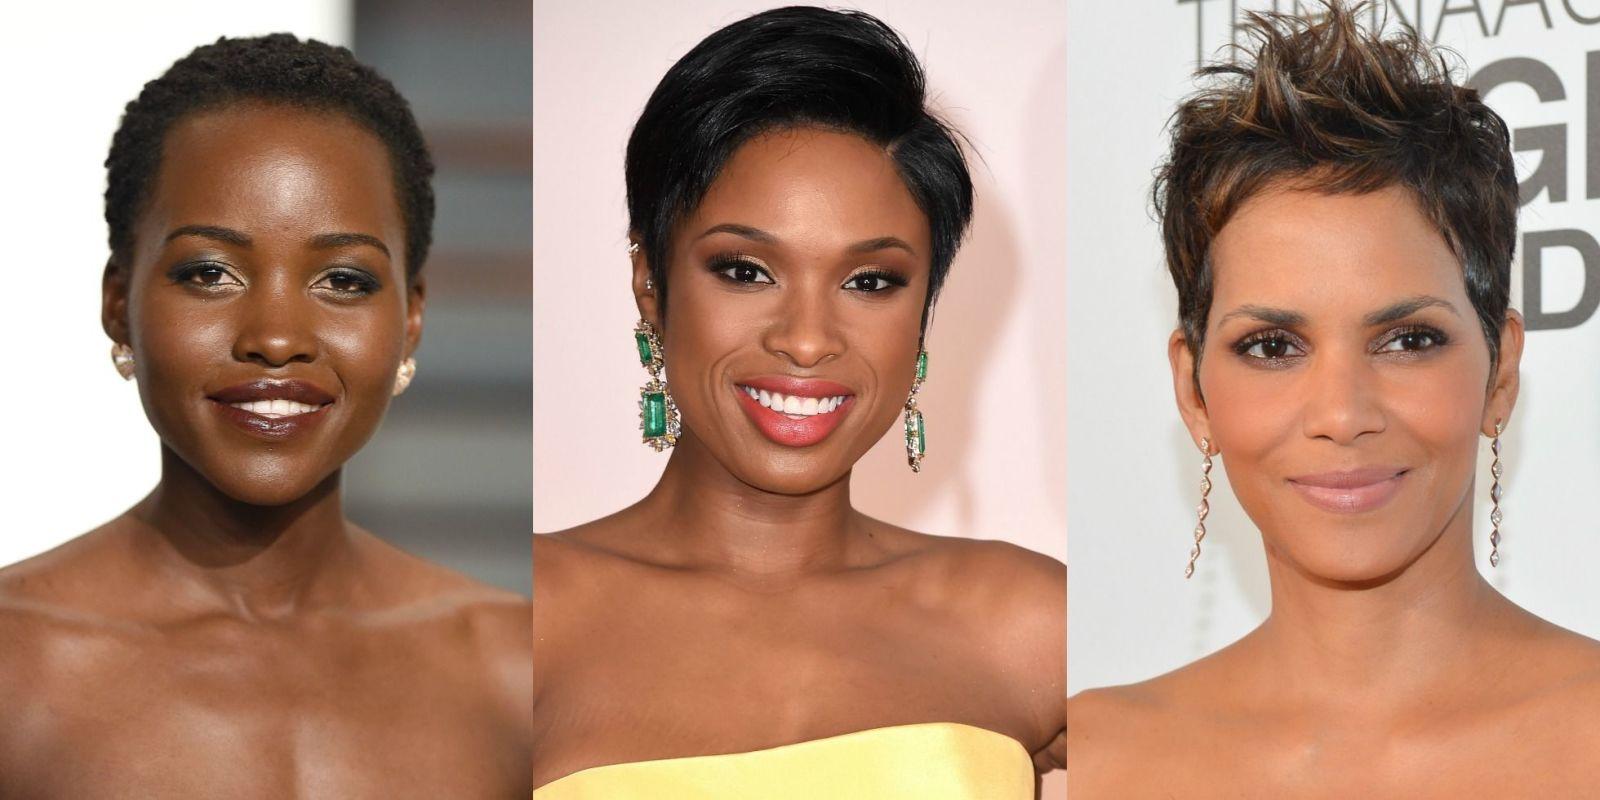 Quick Hair Styles For Short Black Hair: 28 Black Hairstyles For Short Hair